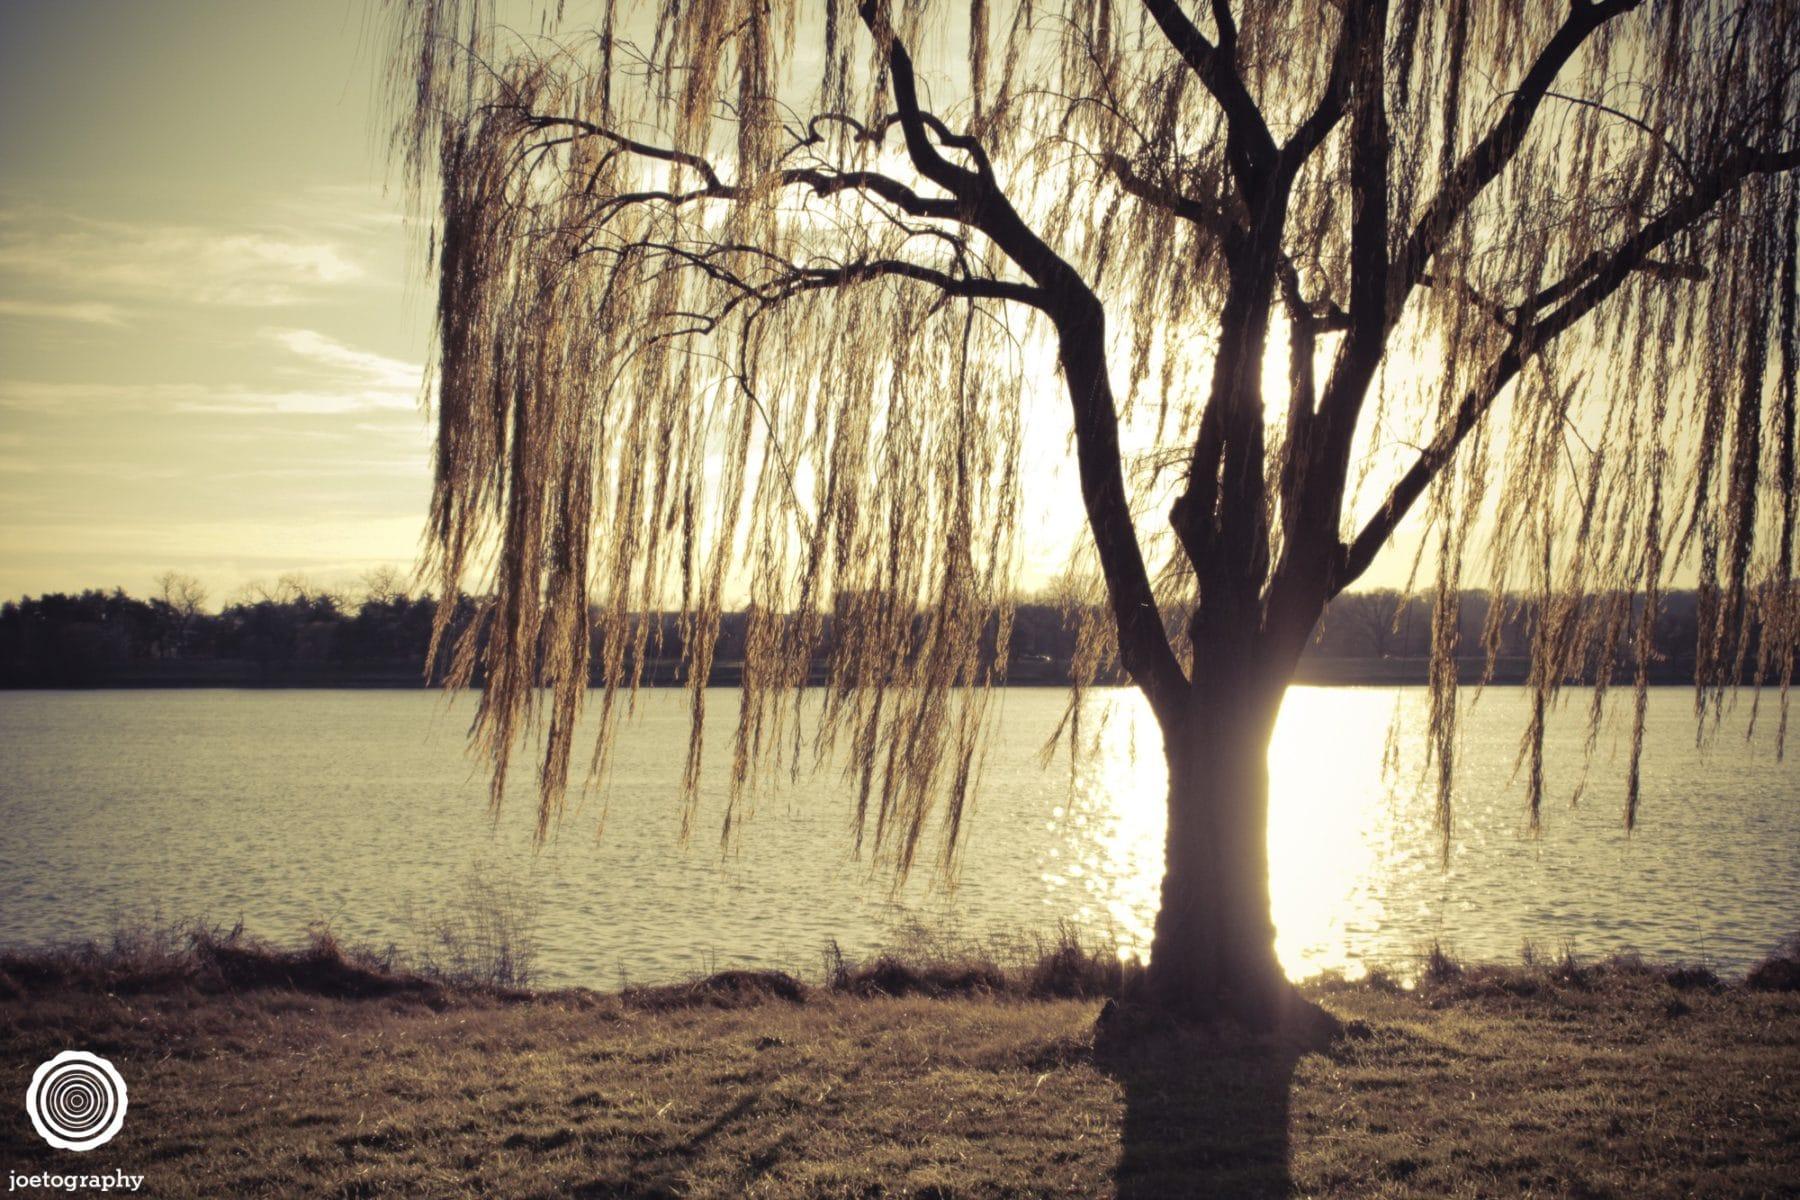 weeping-willow-nature-photography-washington-dc-2